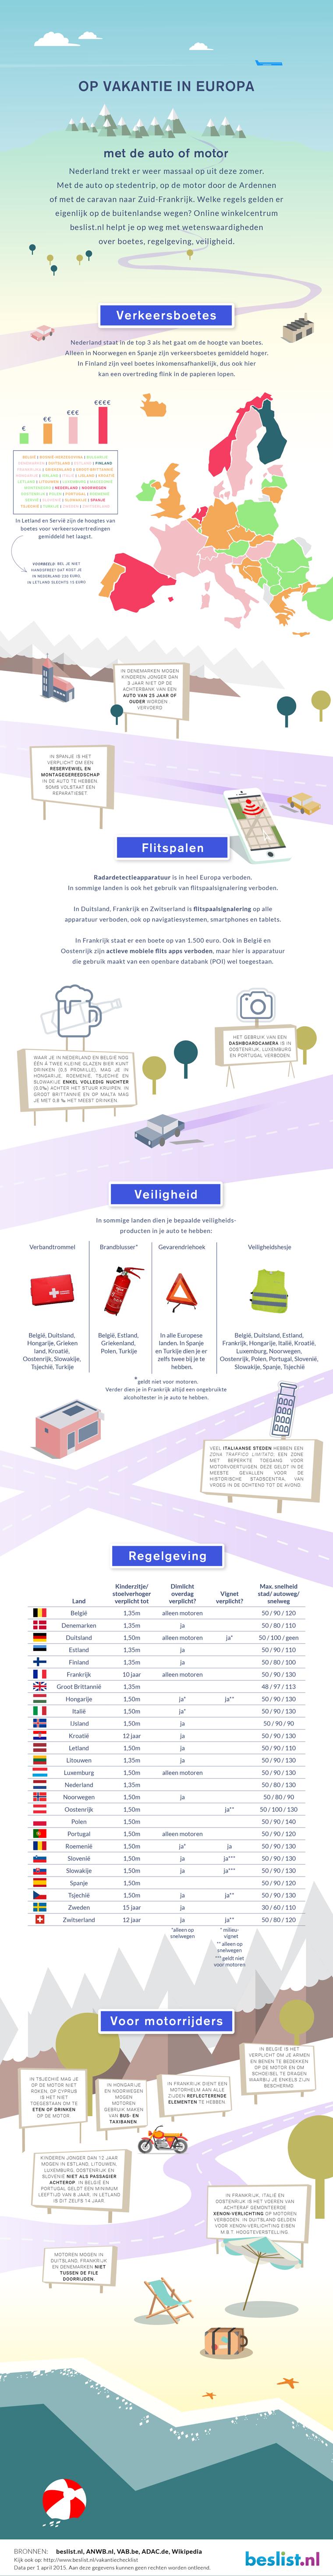 Roadtrip Europa tips